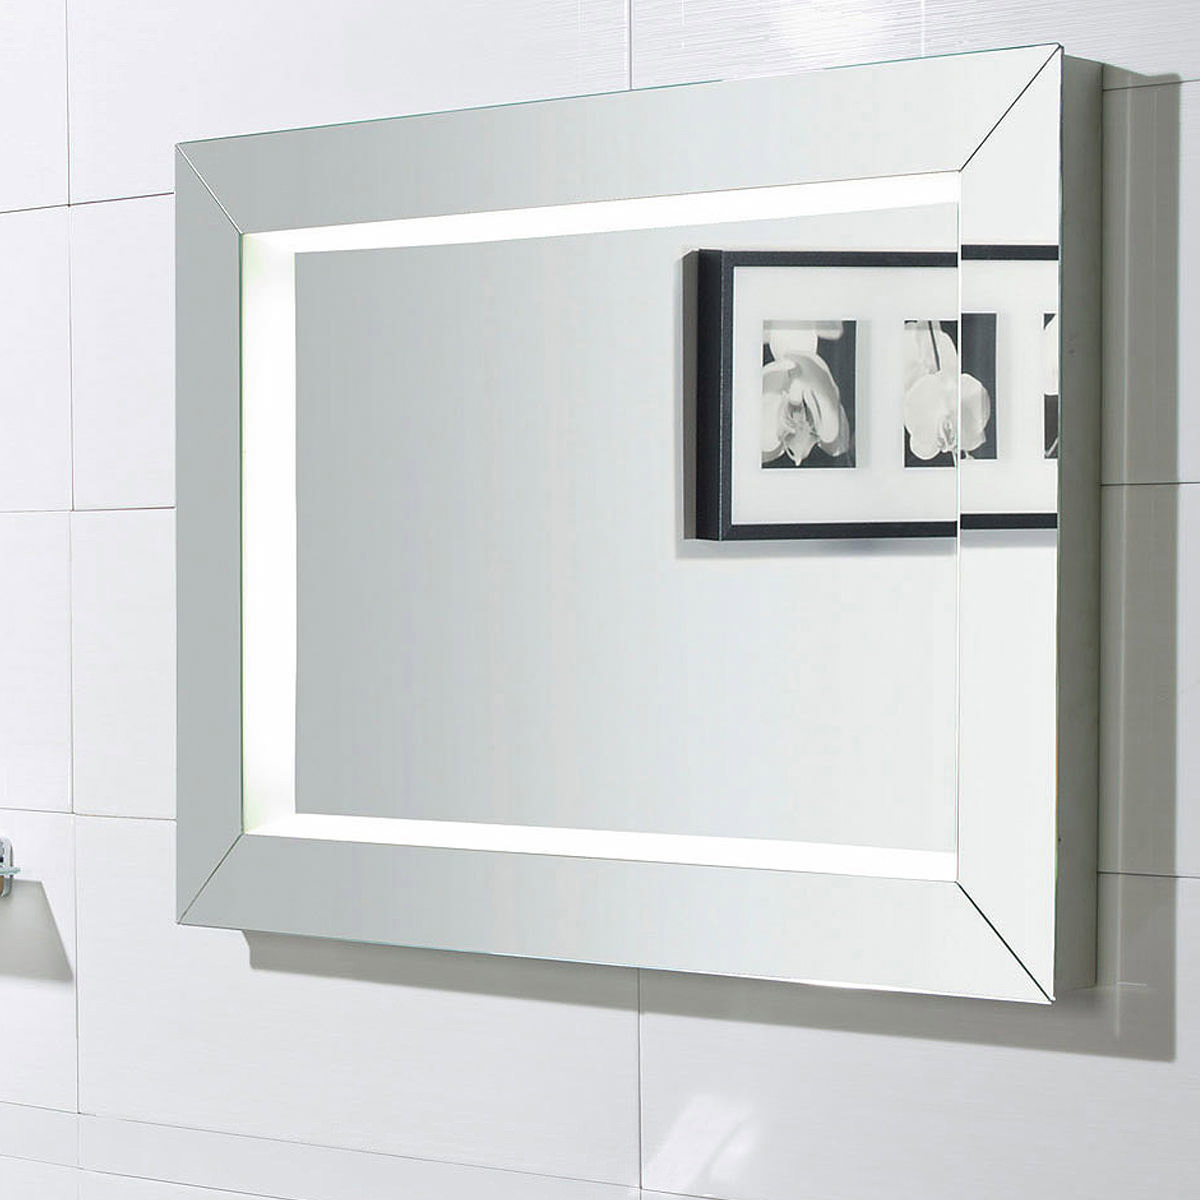 Roper rhodes sense fluorescent illuminated mirror 600mm for Illuminated mirrors